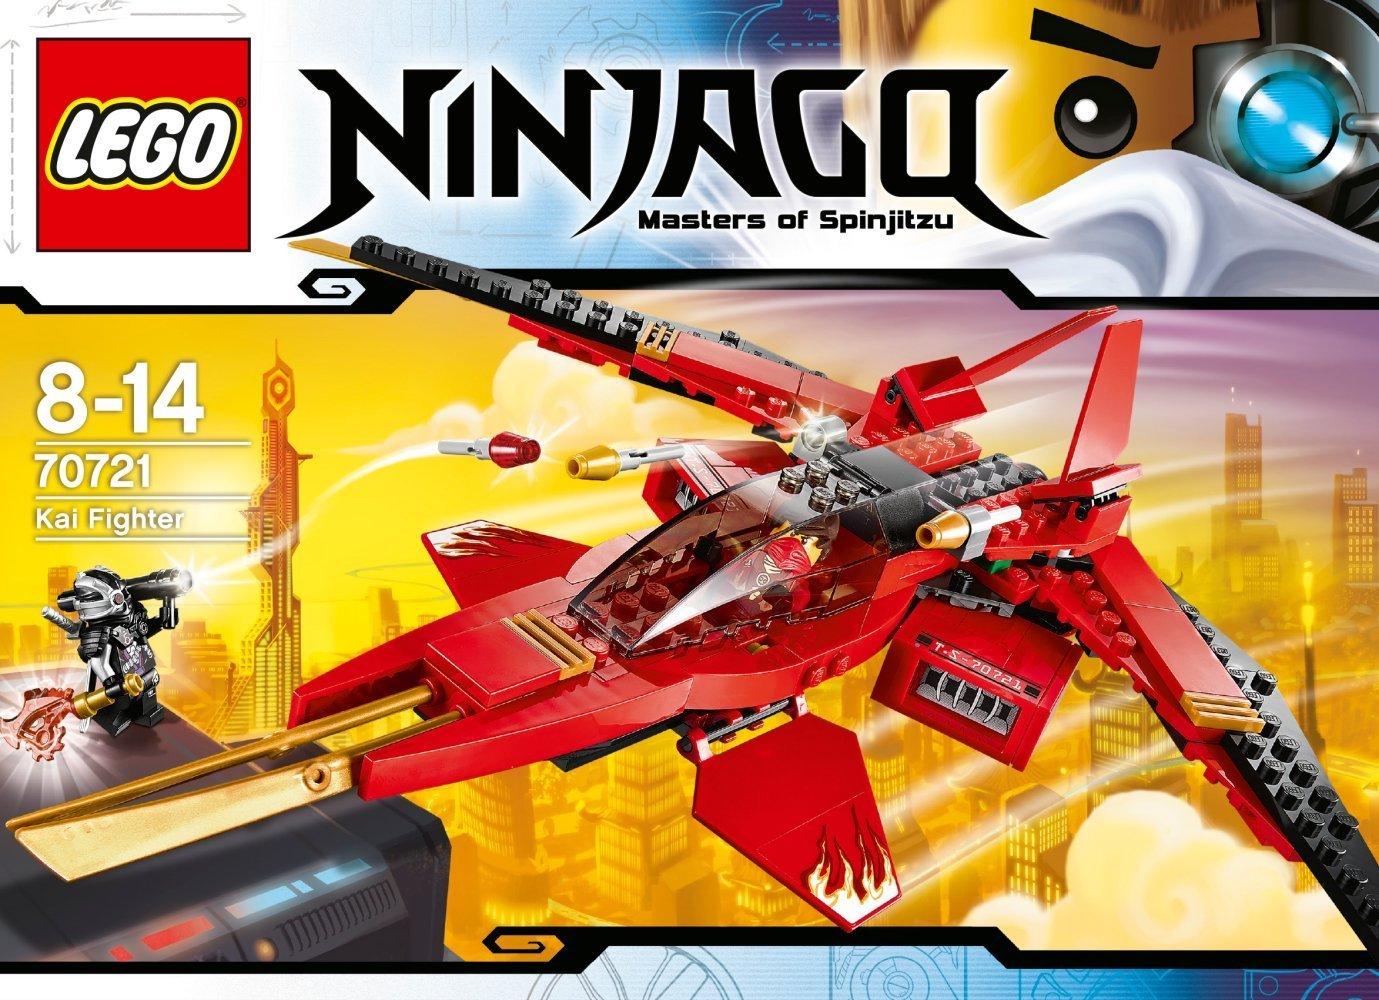 70721 le superjet de kai de lego - Lego ninjago nouvelle saison ...